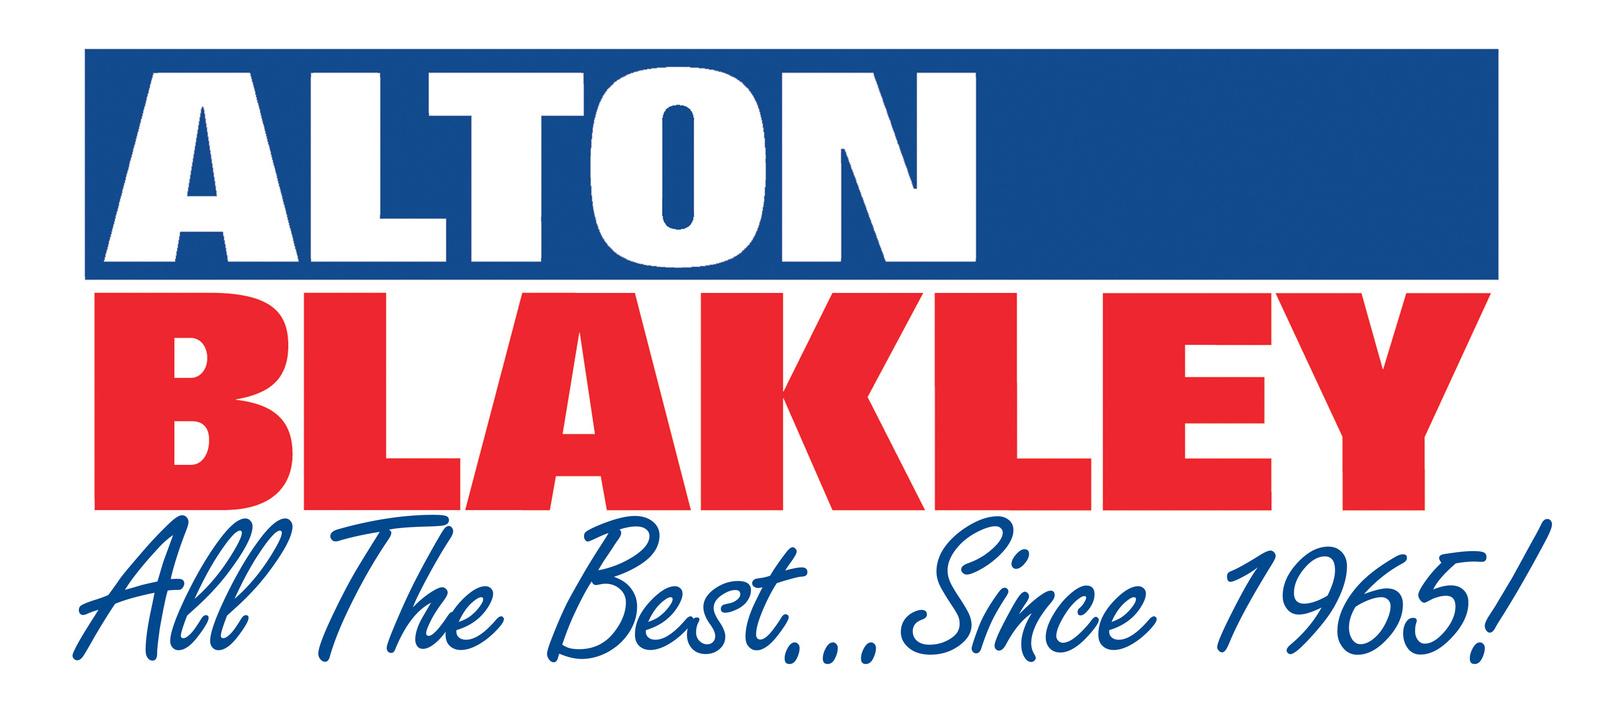 Alton Blakley Ford Mazda - Somerset, KY: Read Consumer ...